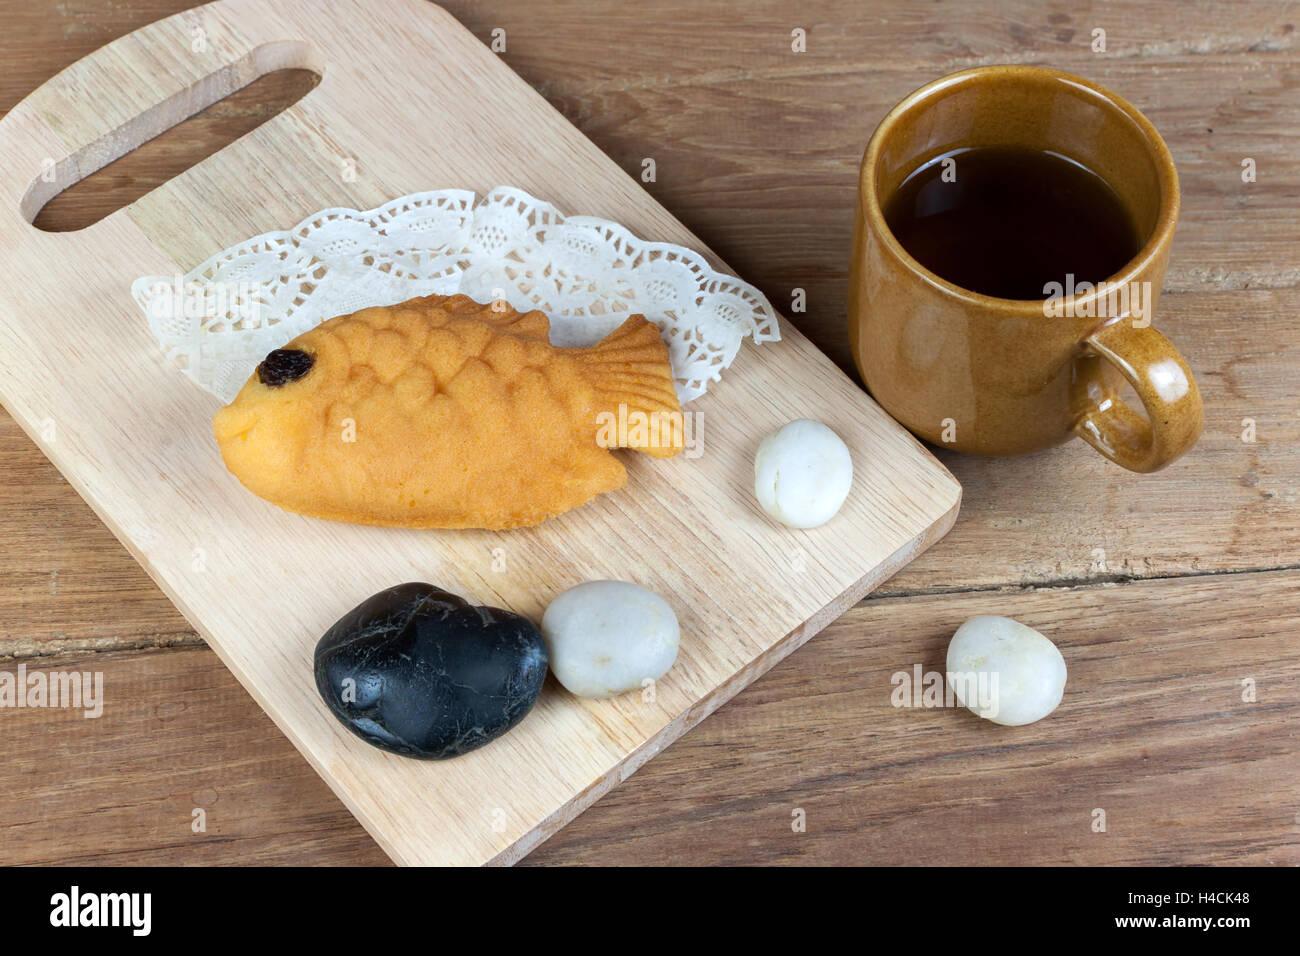 Taiyaki, Japanese Fish Shaped Pancake. Eaten With Hot Tea On Wood Table